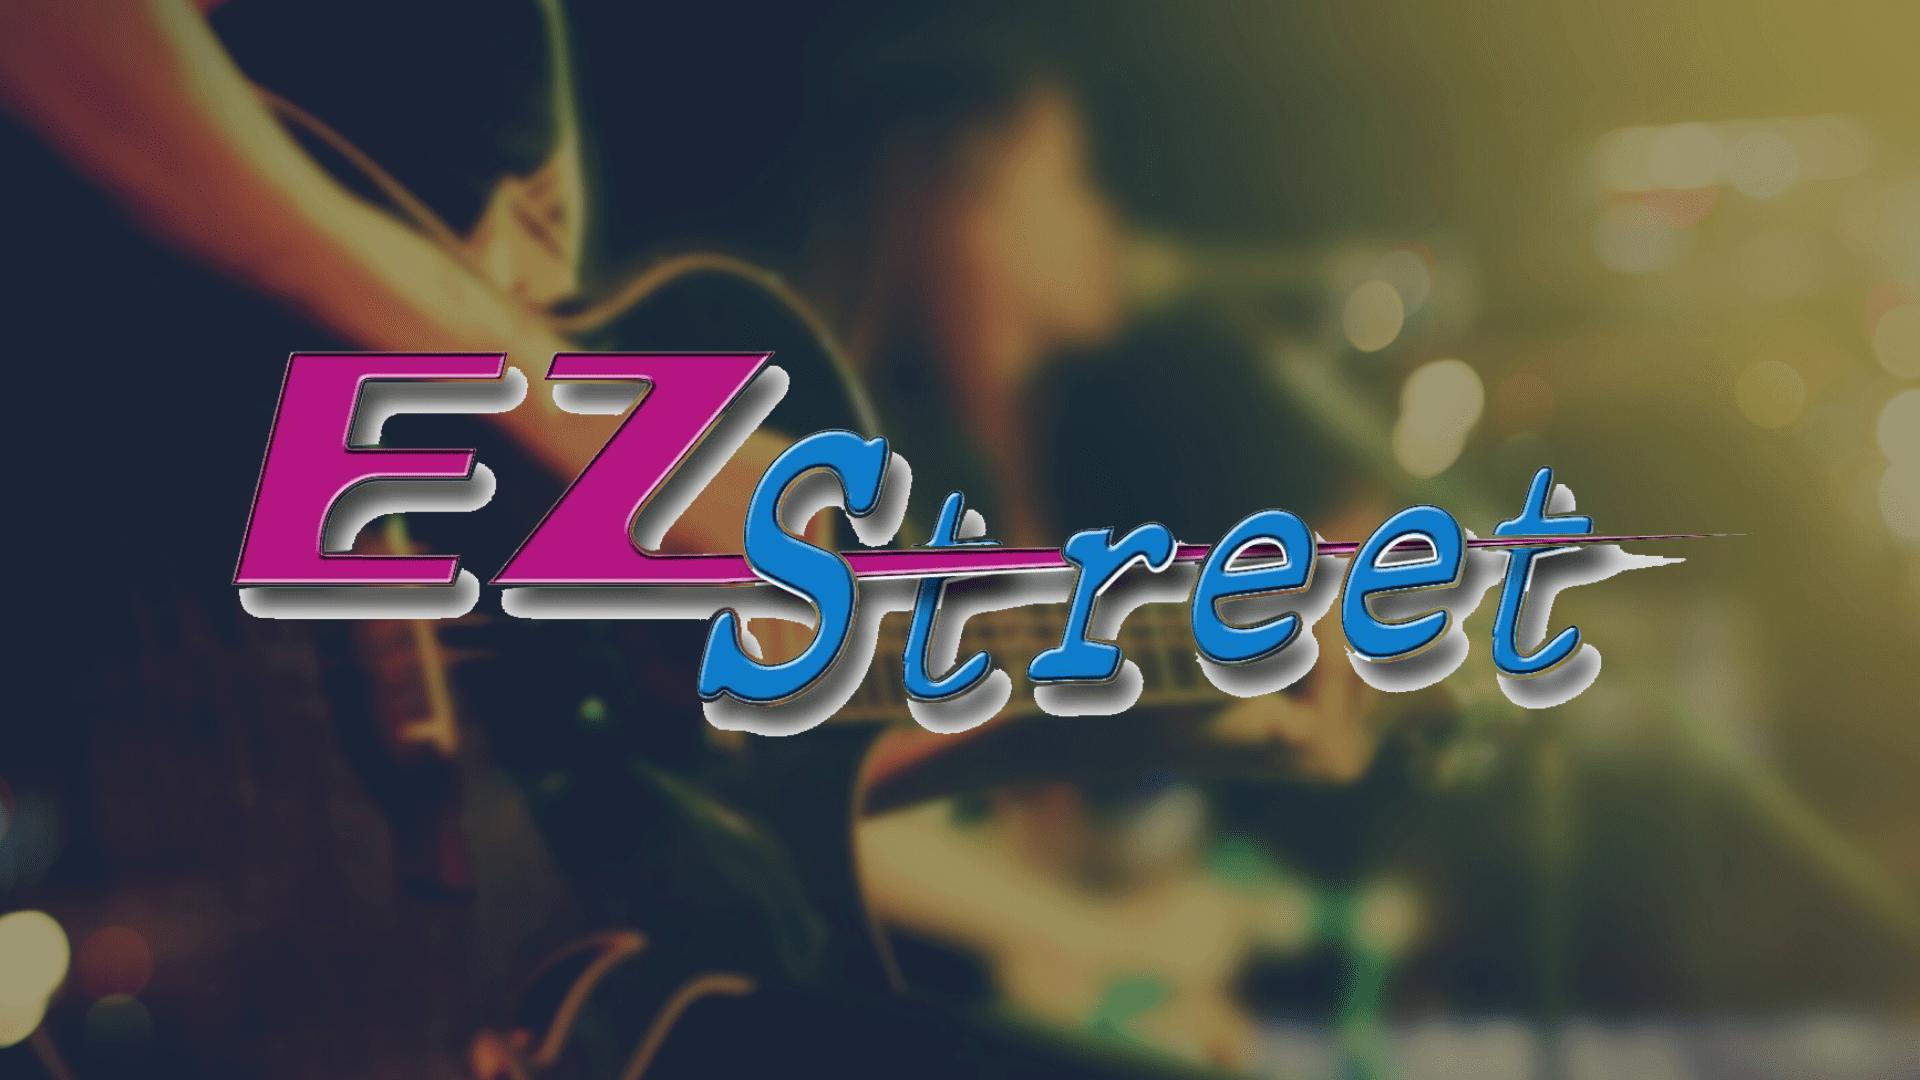 EZ Street Band